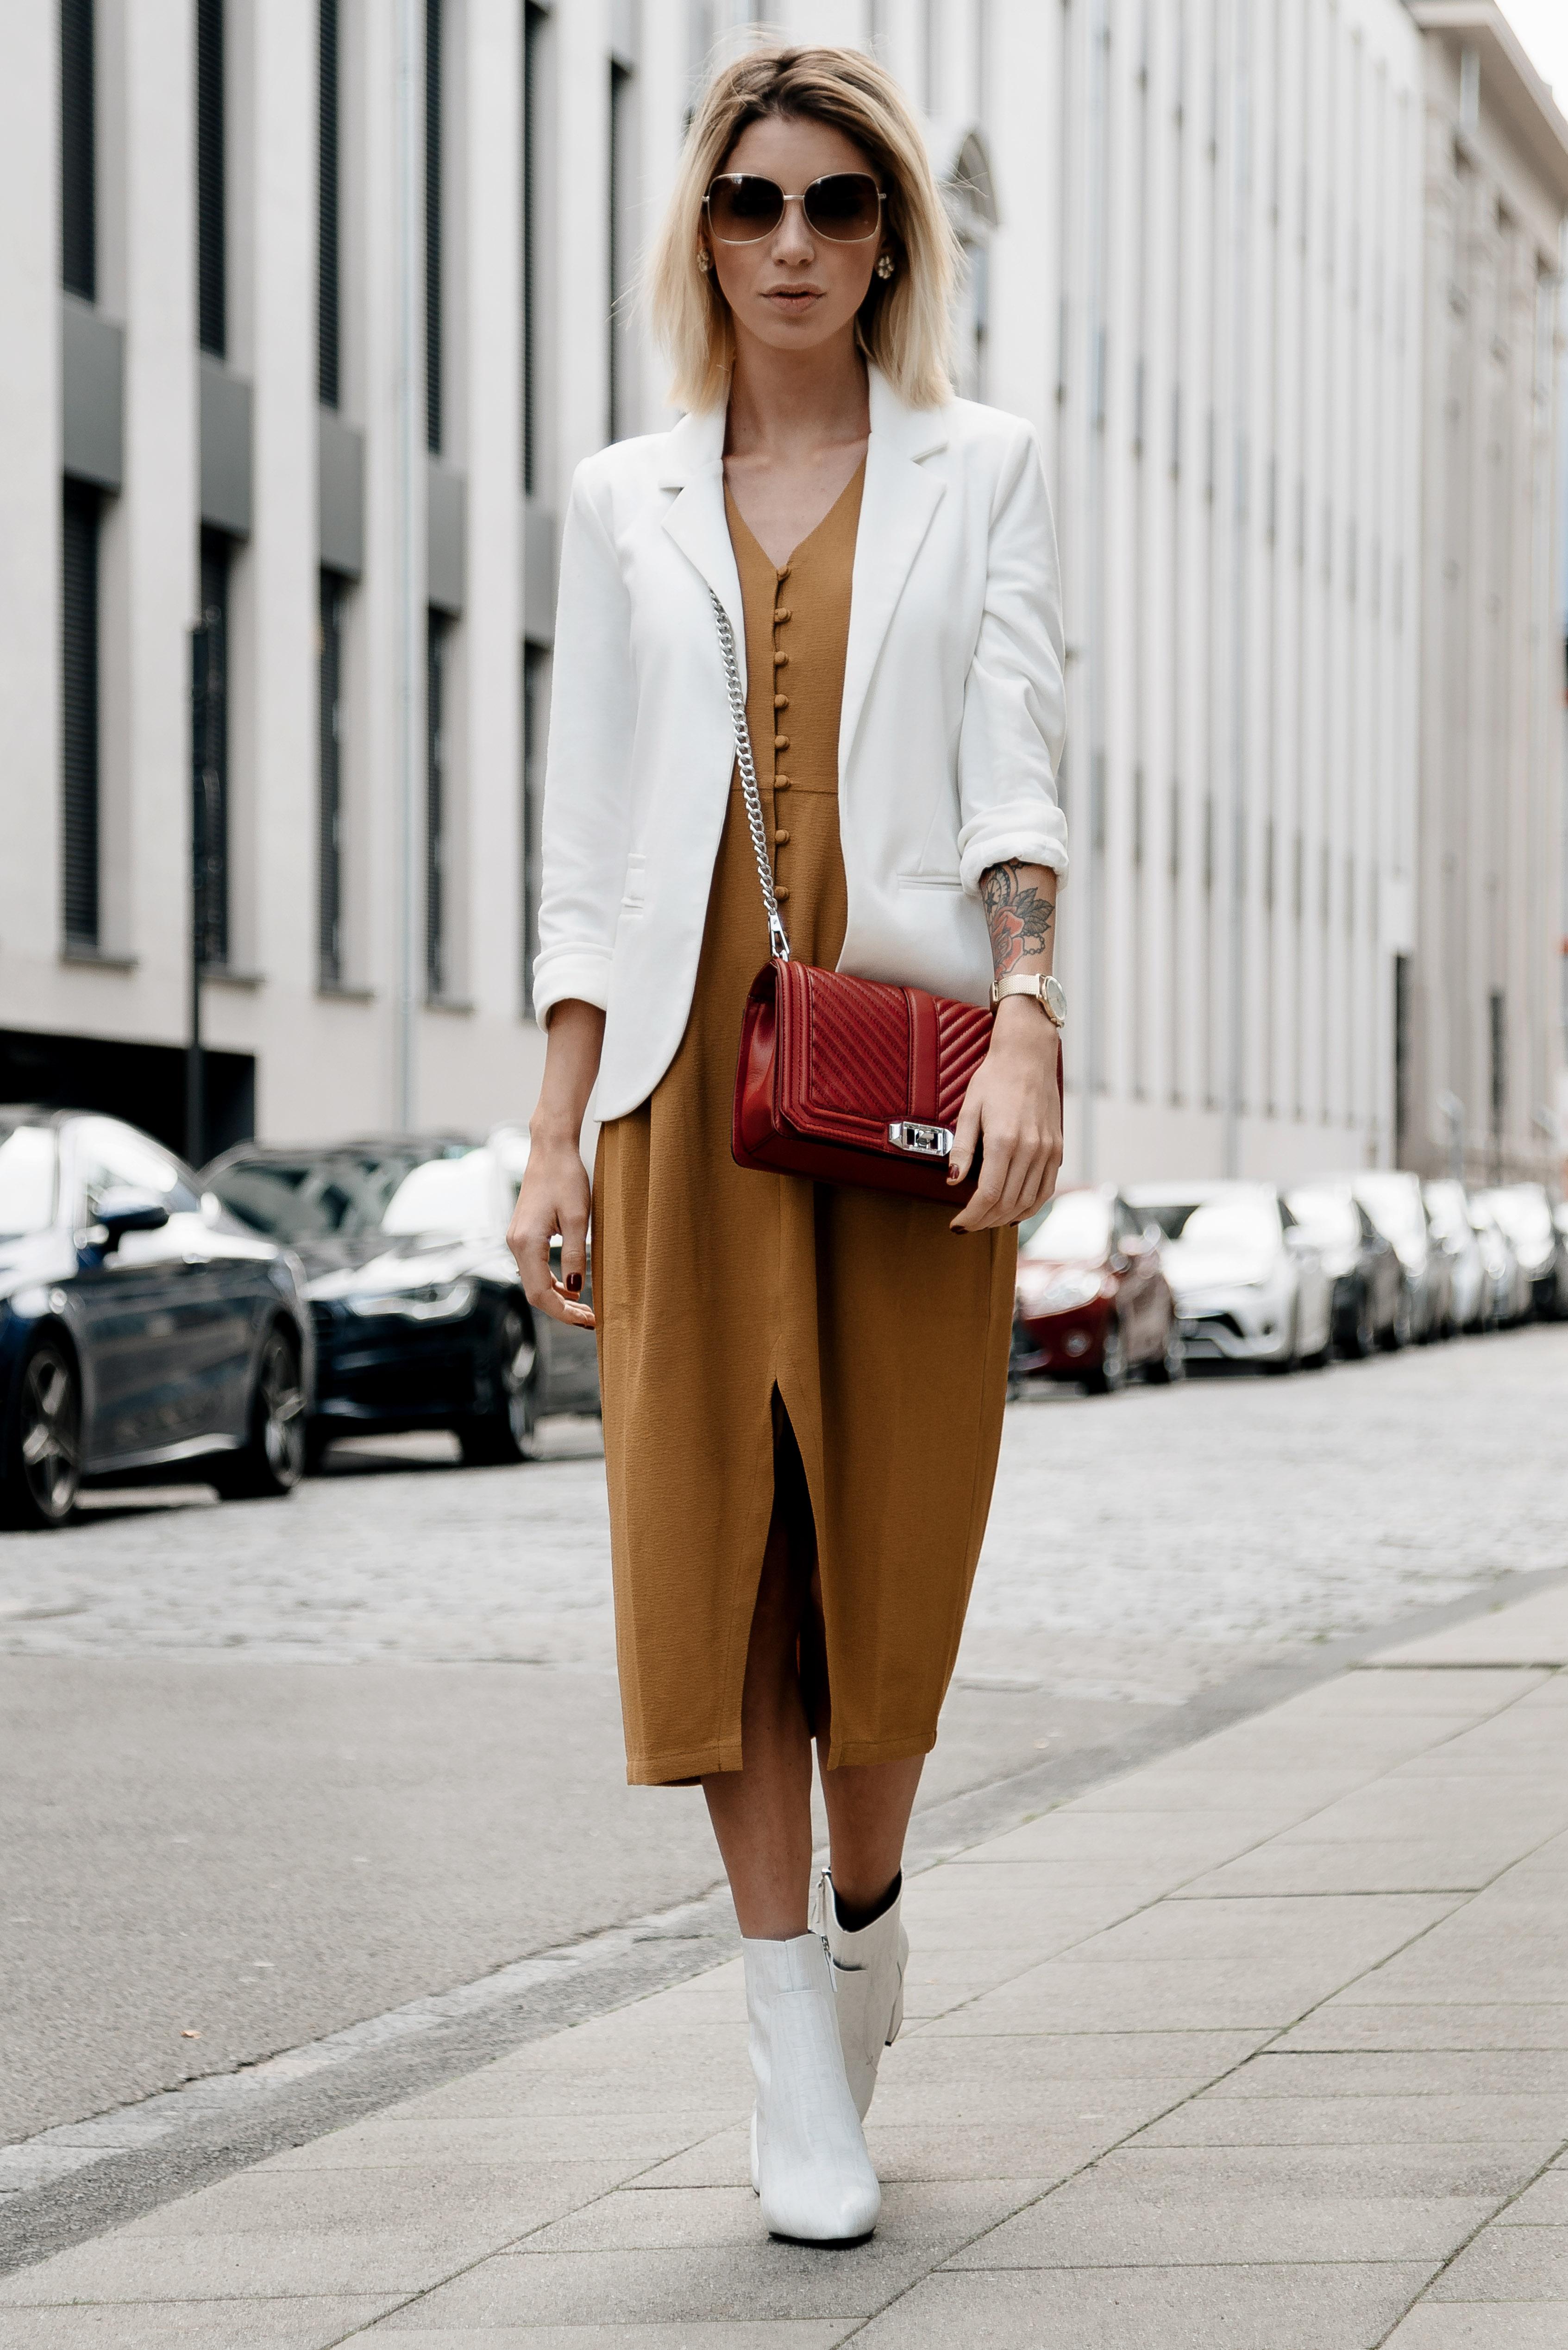 fashionblog-deutschland-koeln-modeblog-streetstyle-ootd